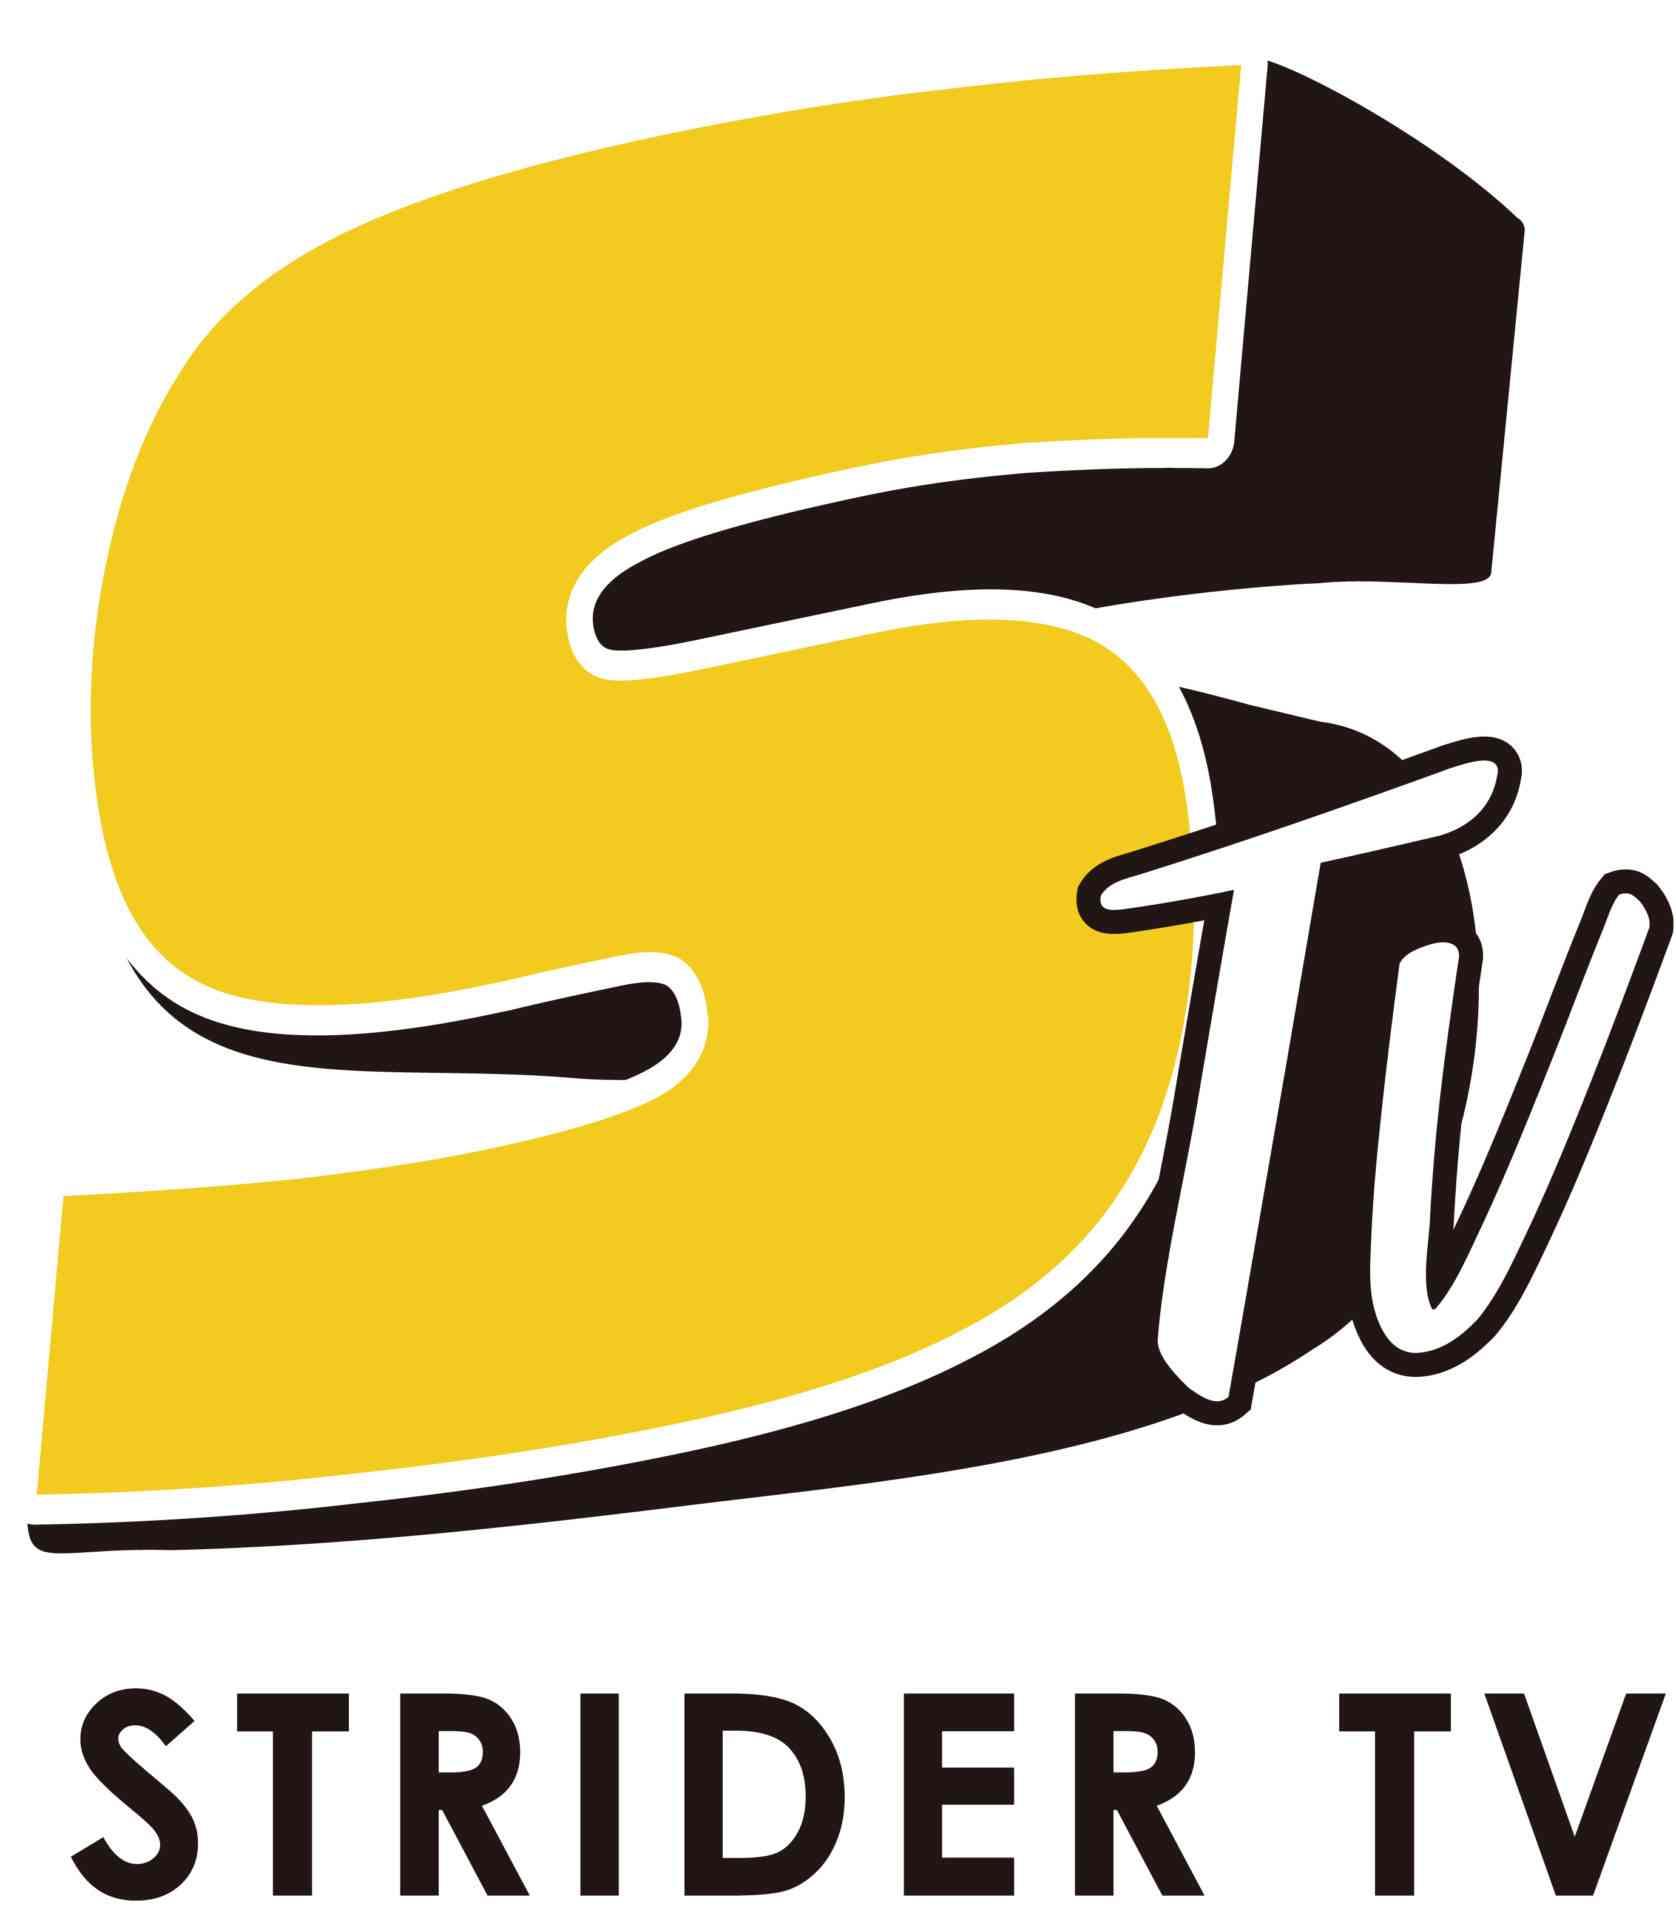 STRIDER TV|5/24(日)ライブ配信のお知らせ!